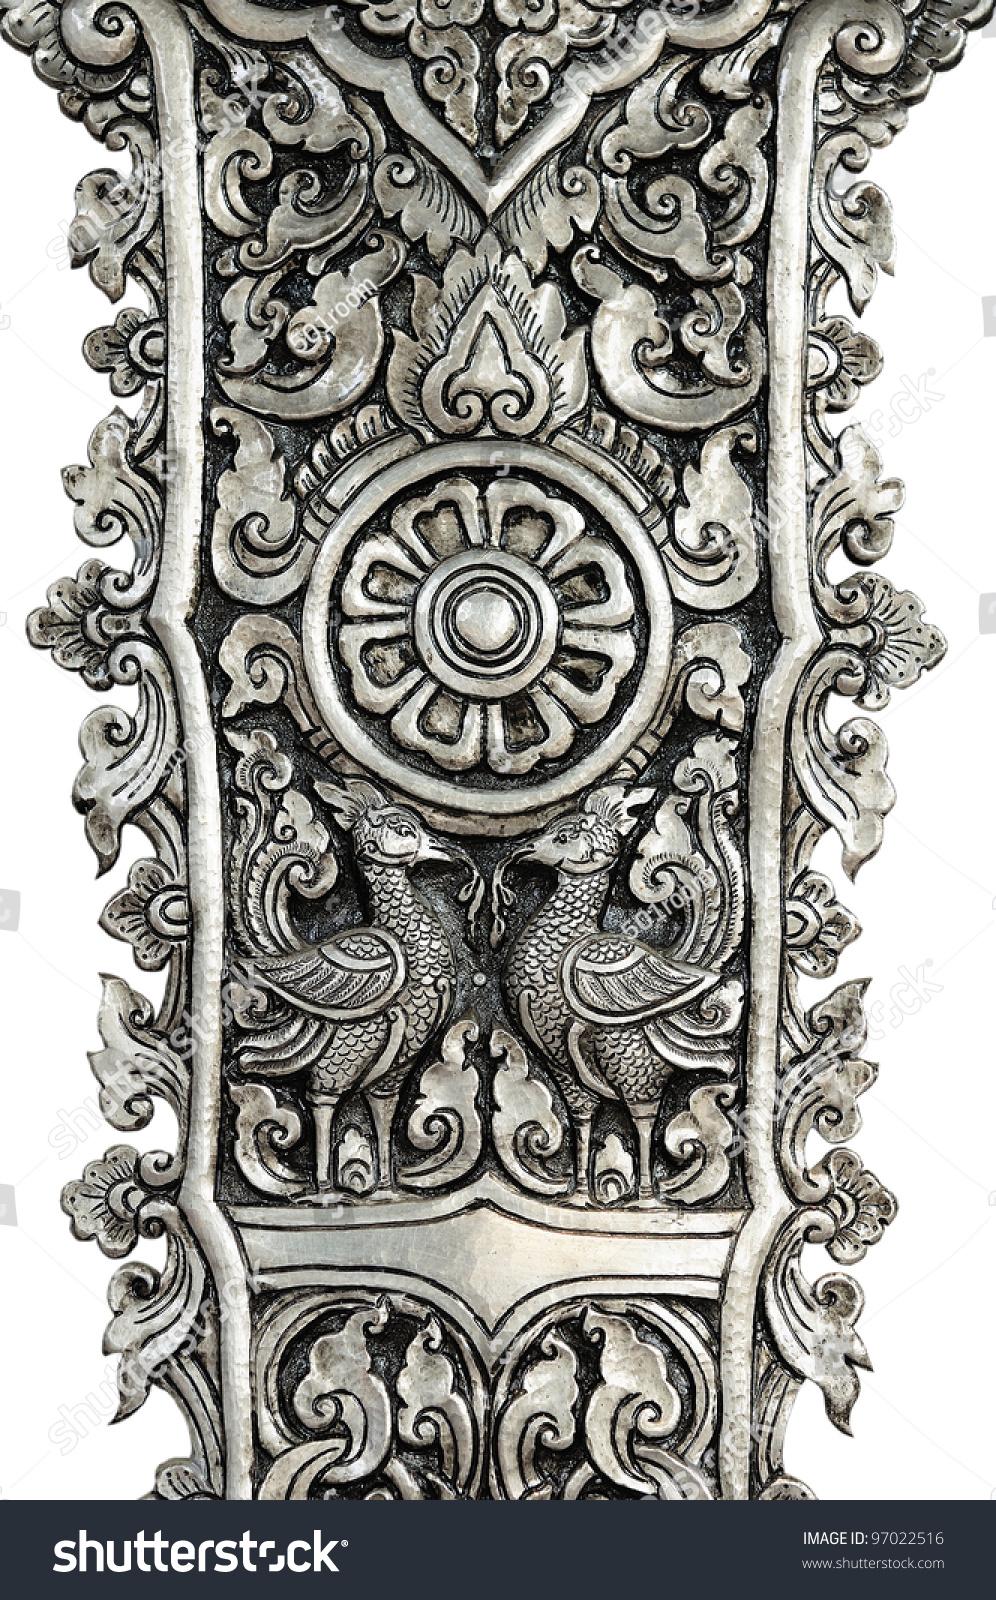 decorative art of lanna thai engraving of the silver value - Decorative Art